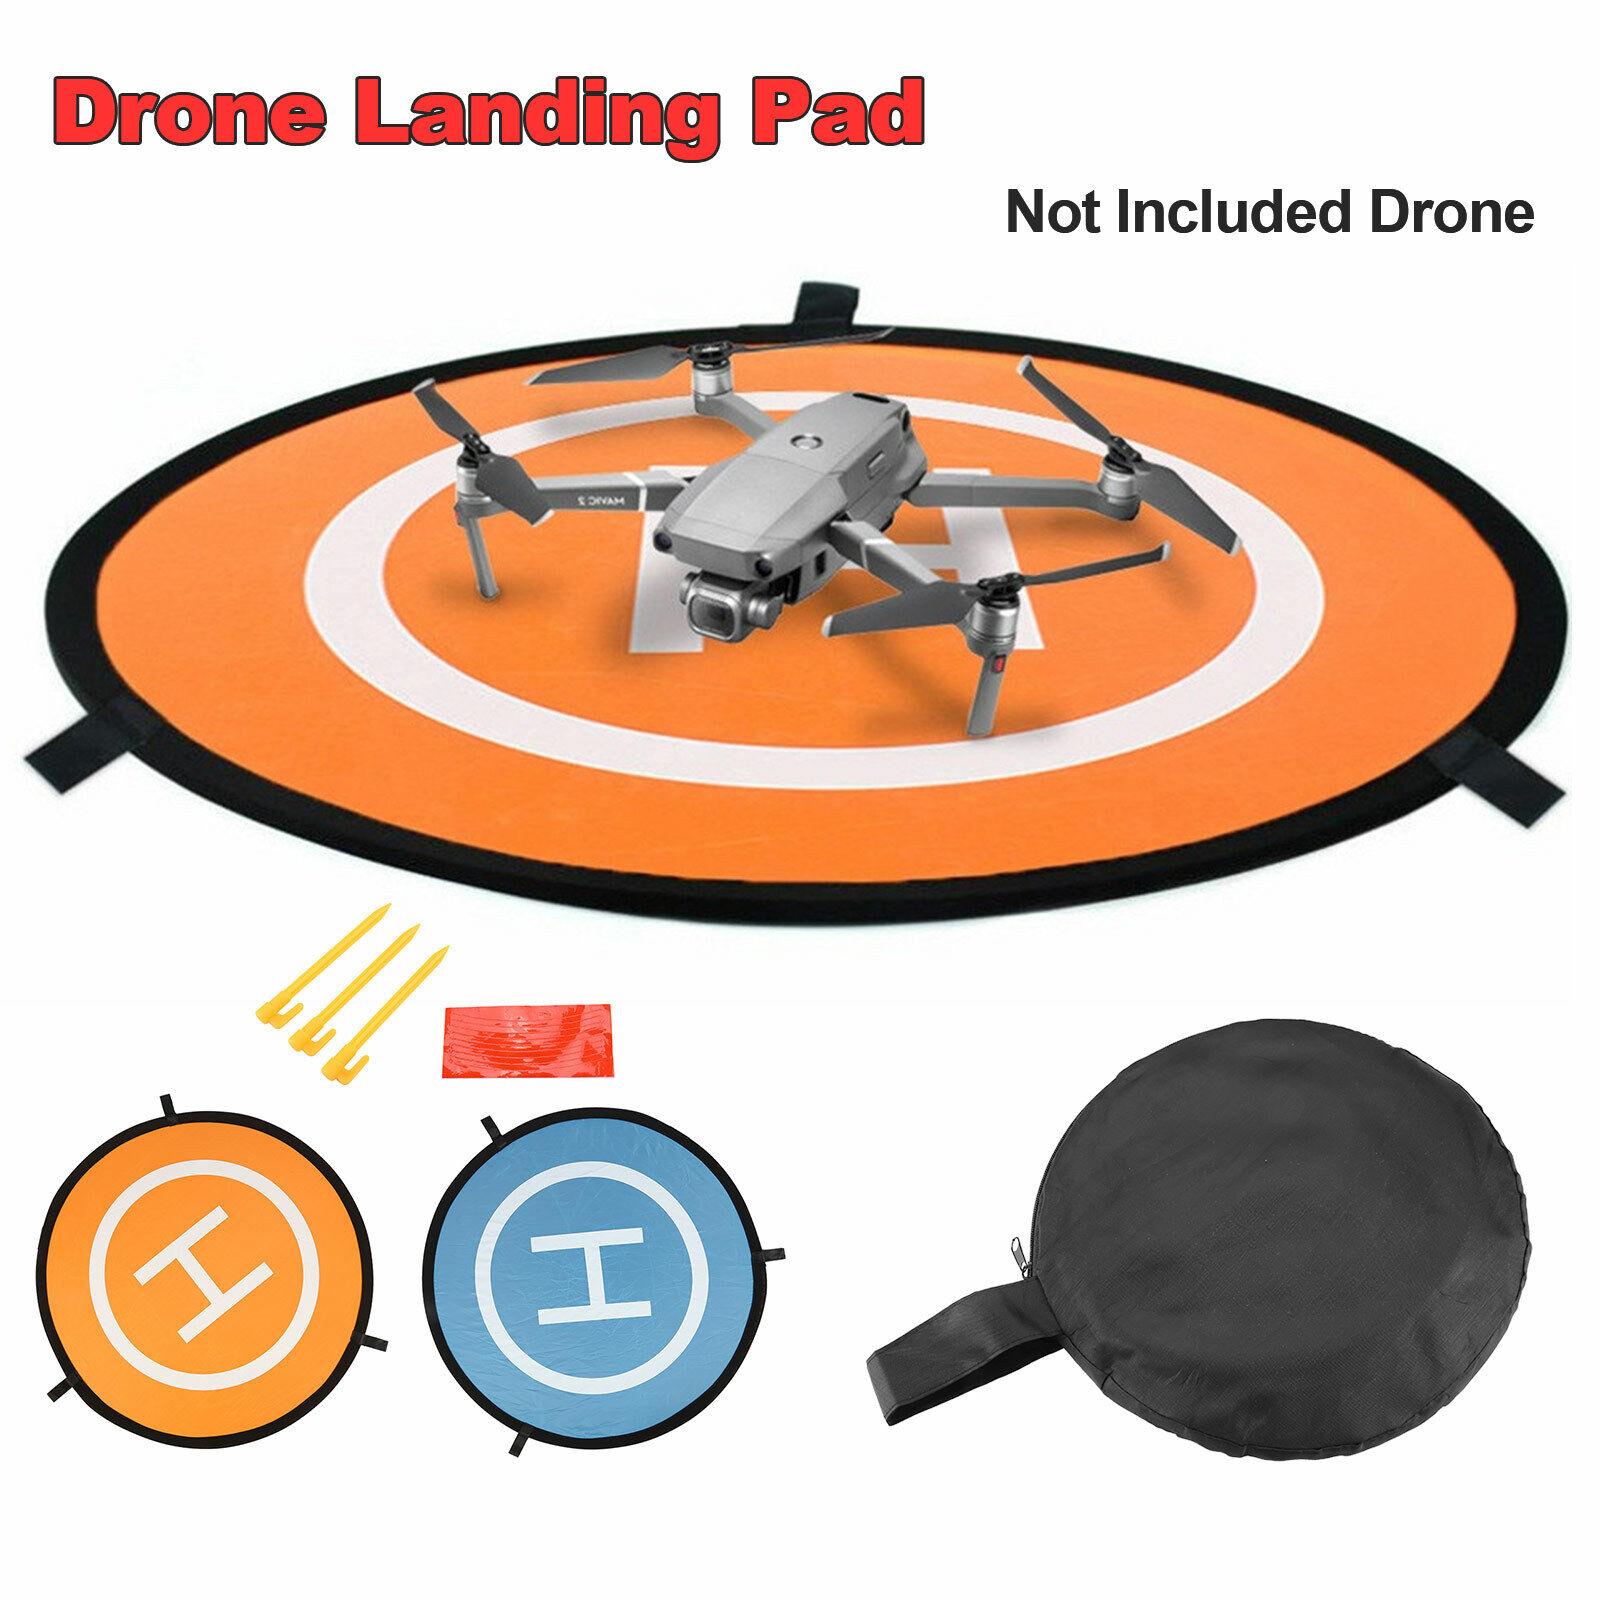 75cm Drone Launch Pad Landing Mat Helipad Foldable for DJI Mavic Phantom 4/3 UK